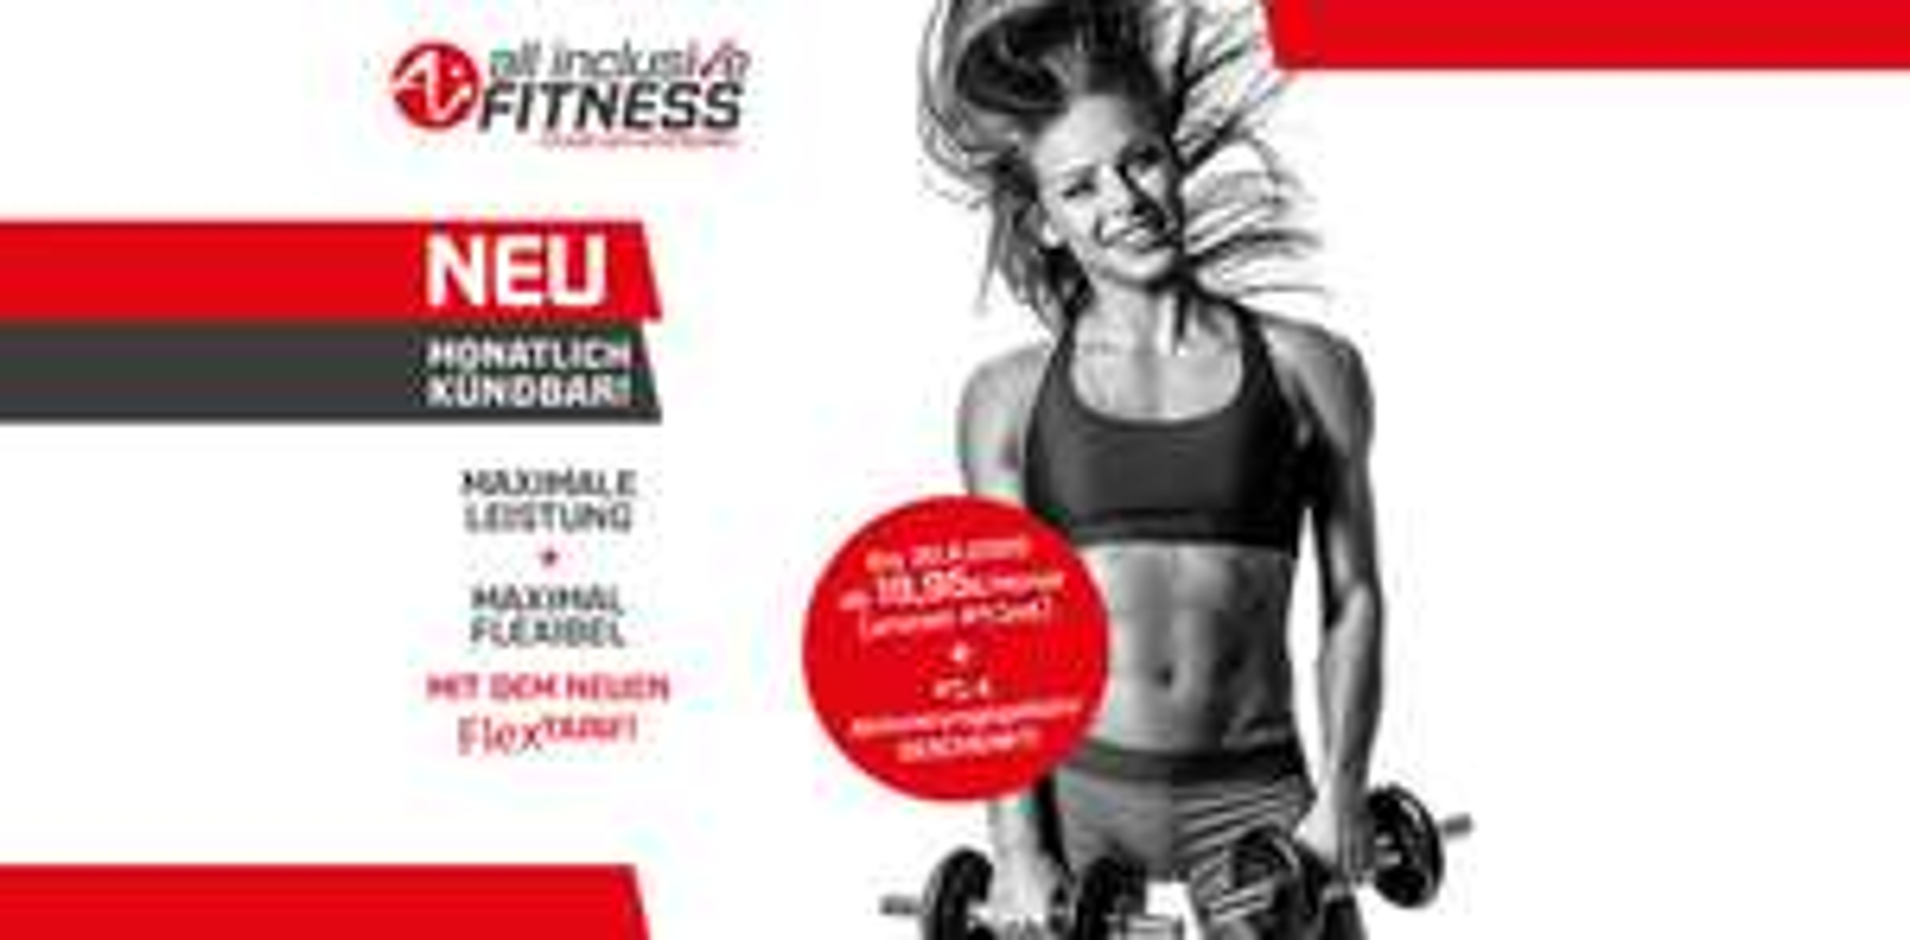 All Inclusive (AI) Fitness Flex-Tarif ohne Aktivierungsgebühr   Monatlich kündbar